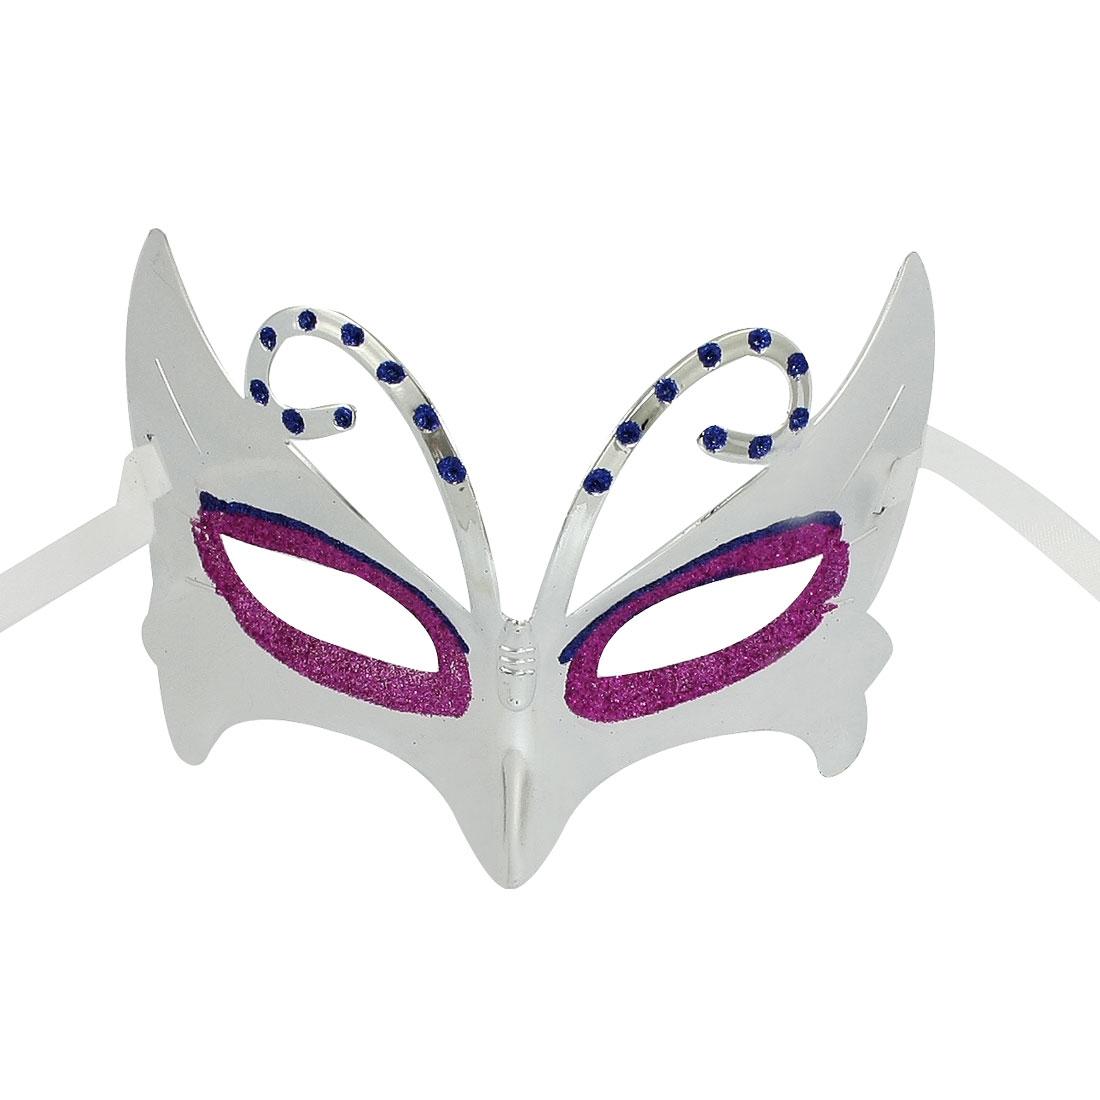 Magenta Blue Glittery Powder Decor Self Tie Party Eye Mask Silver Tone